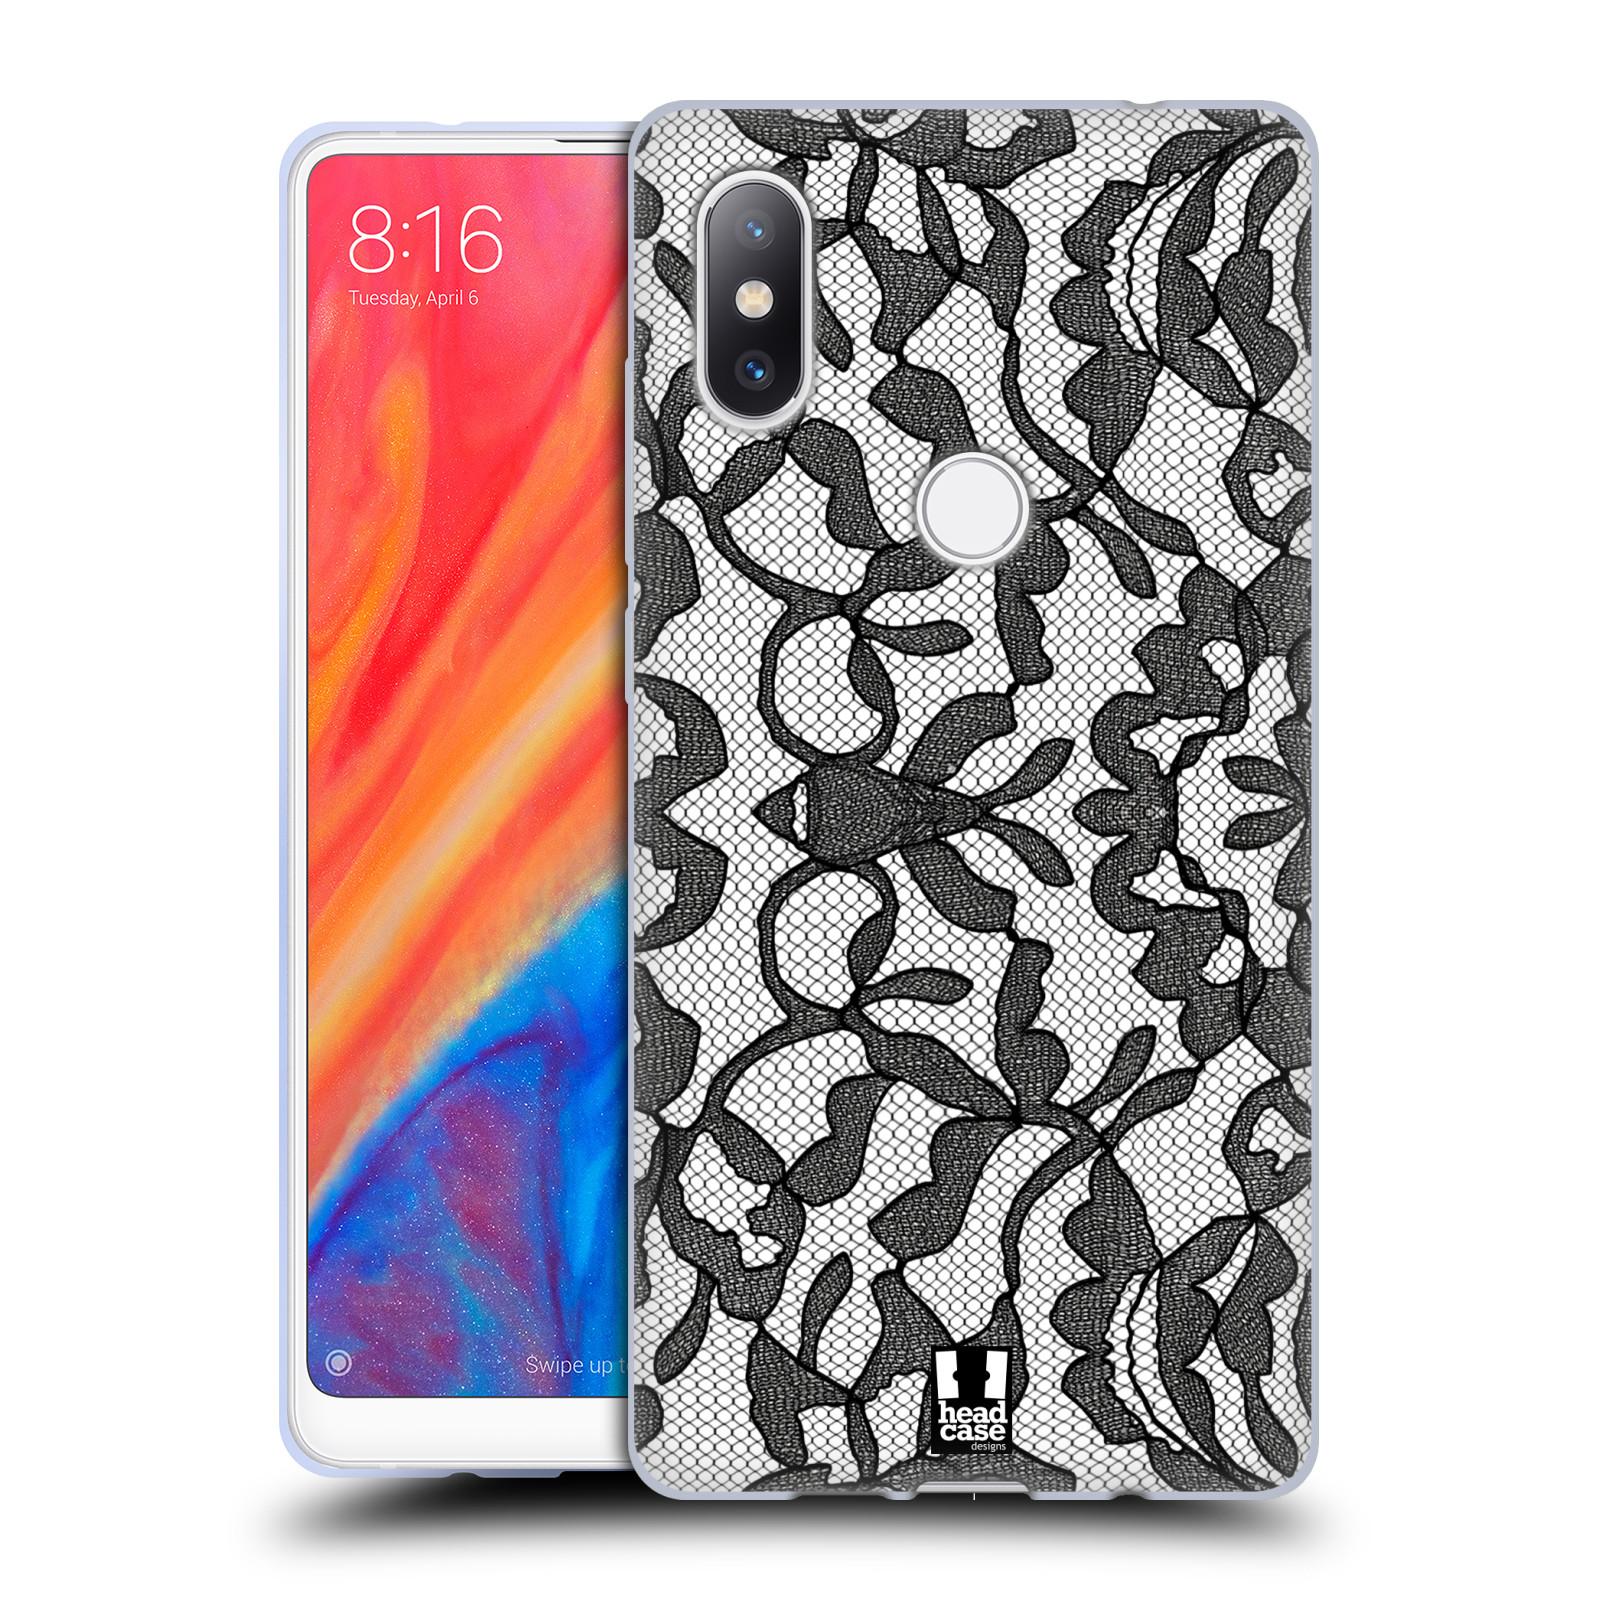 Silikonové pouzdro na mobil Xiaomi Mi Mix 2S - Head Case - LEAFY KRAJKA